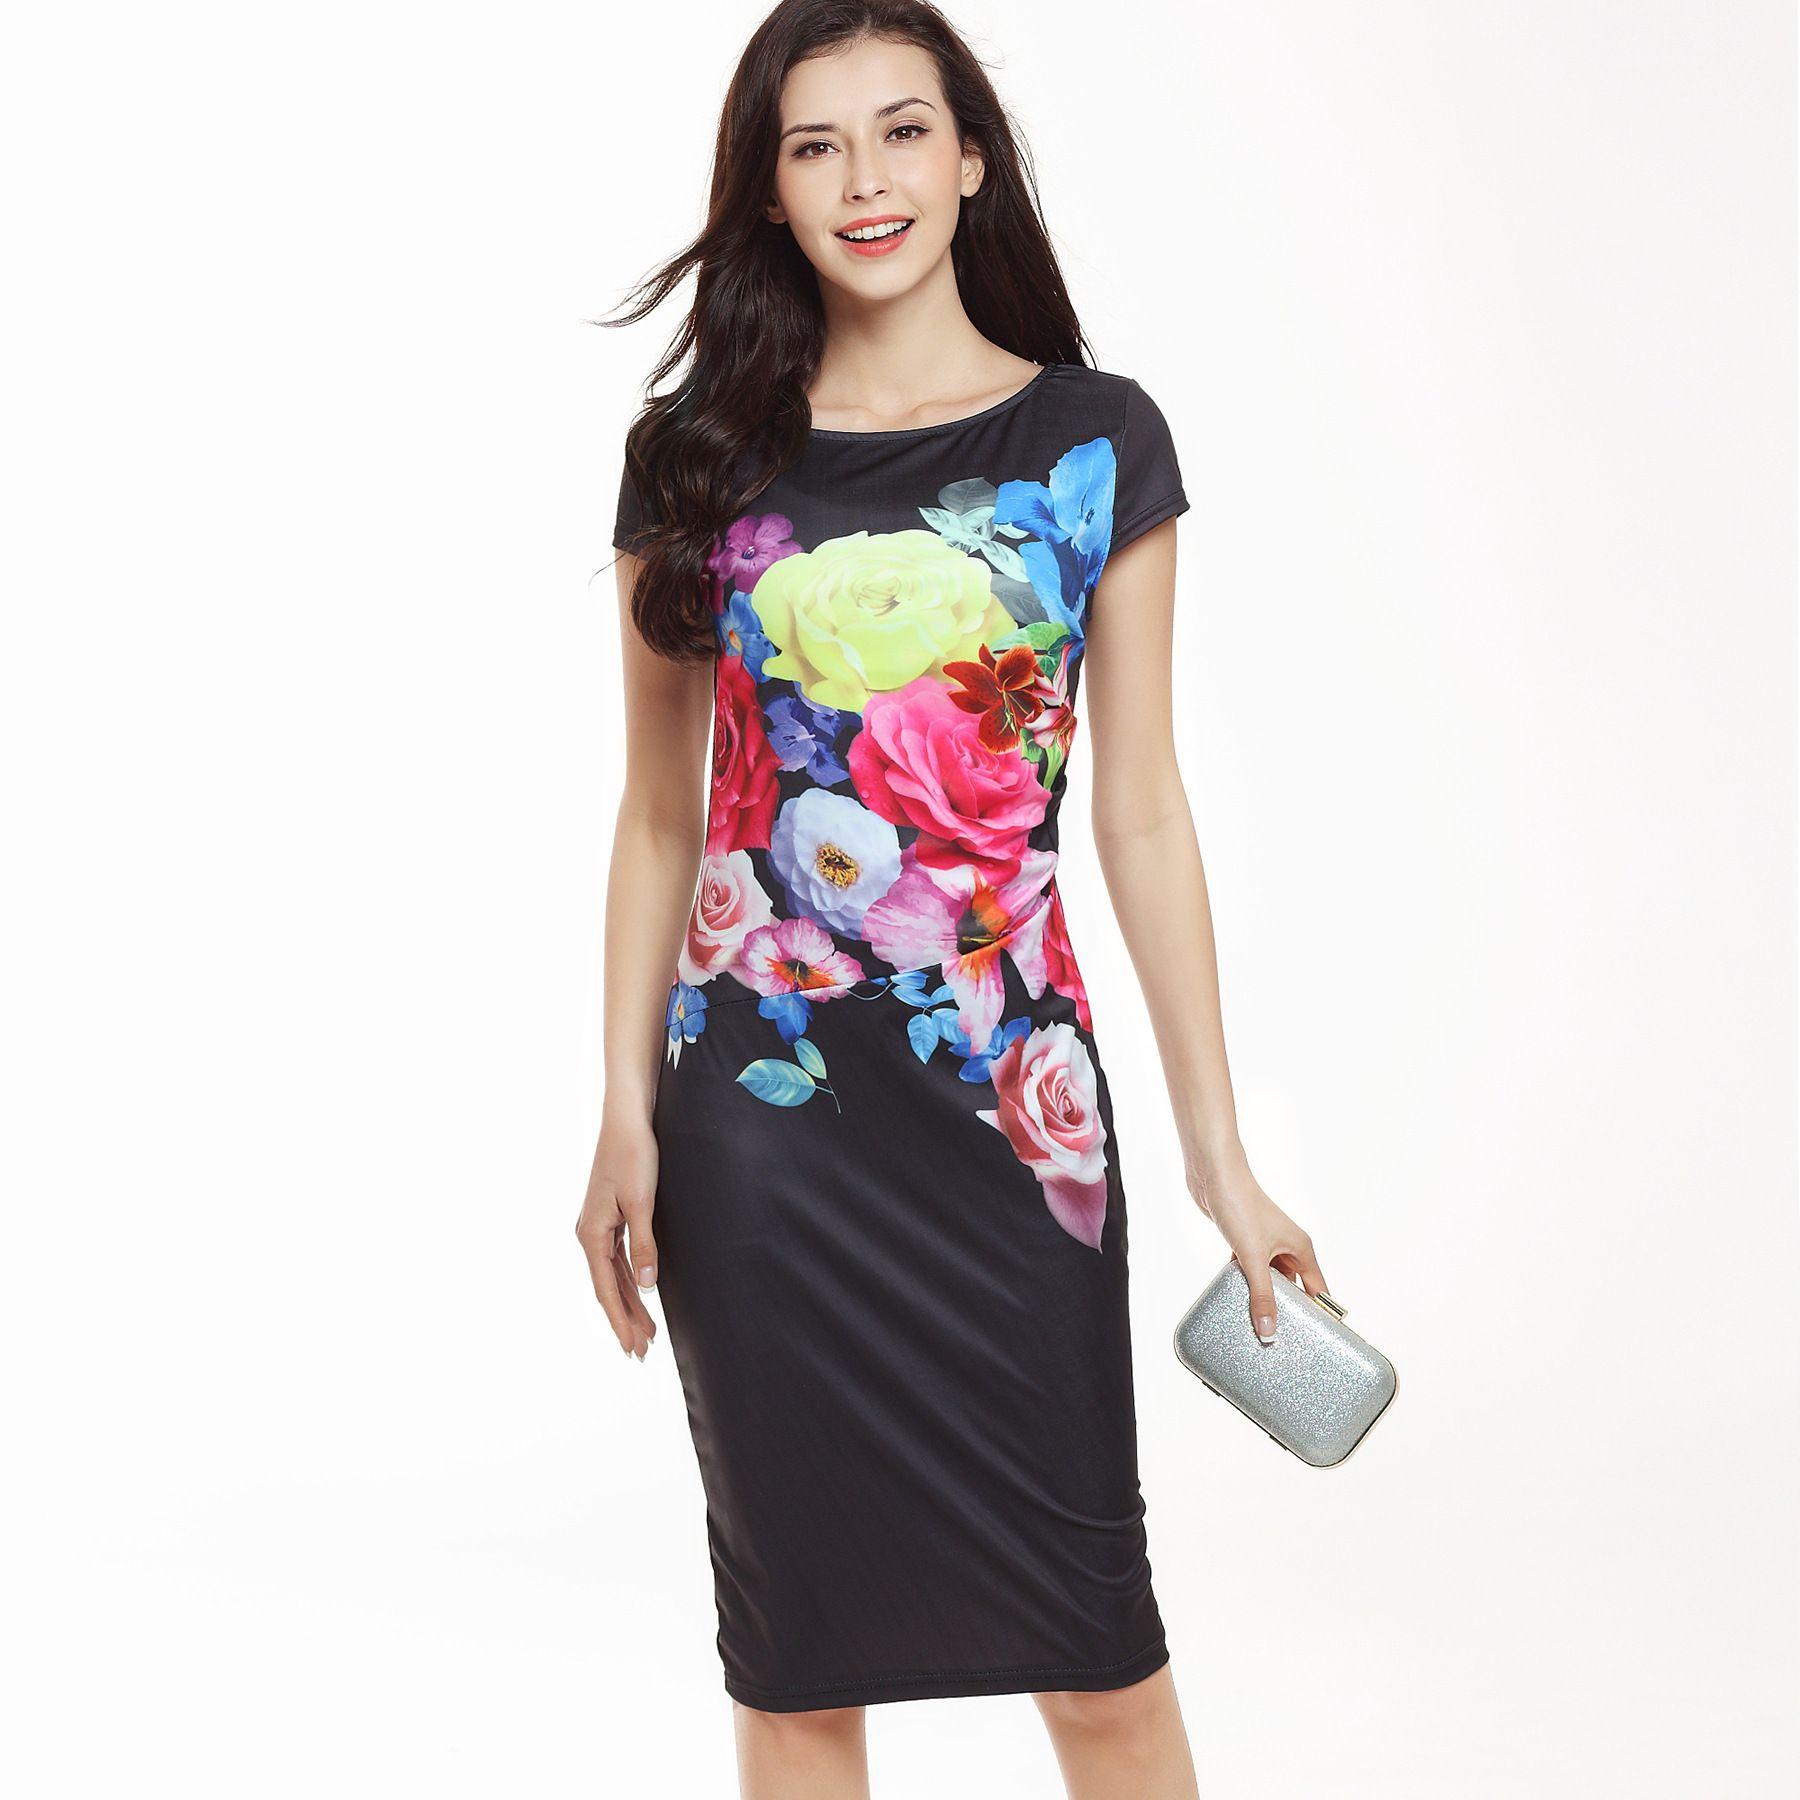 e2263445dc Wholesale Bodycon Dresses China